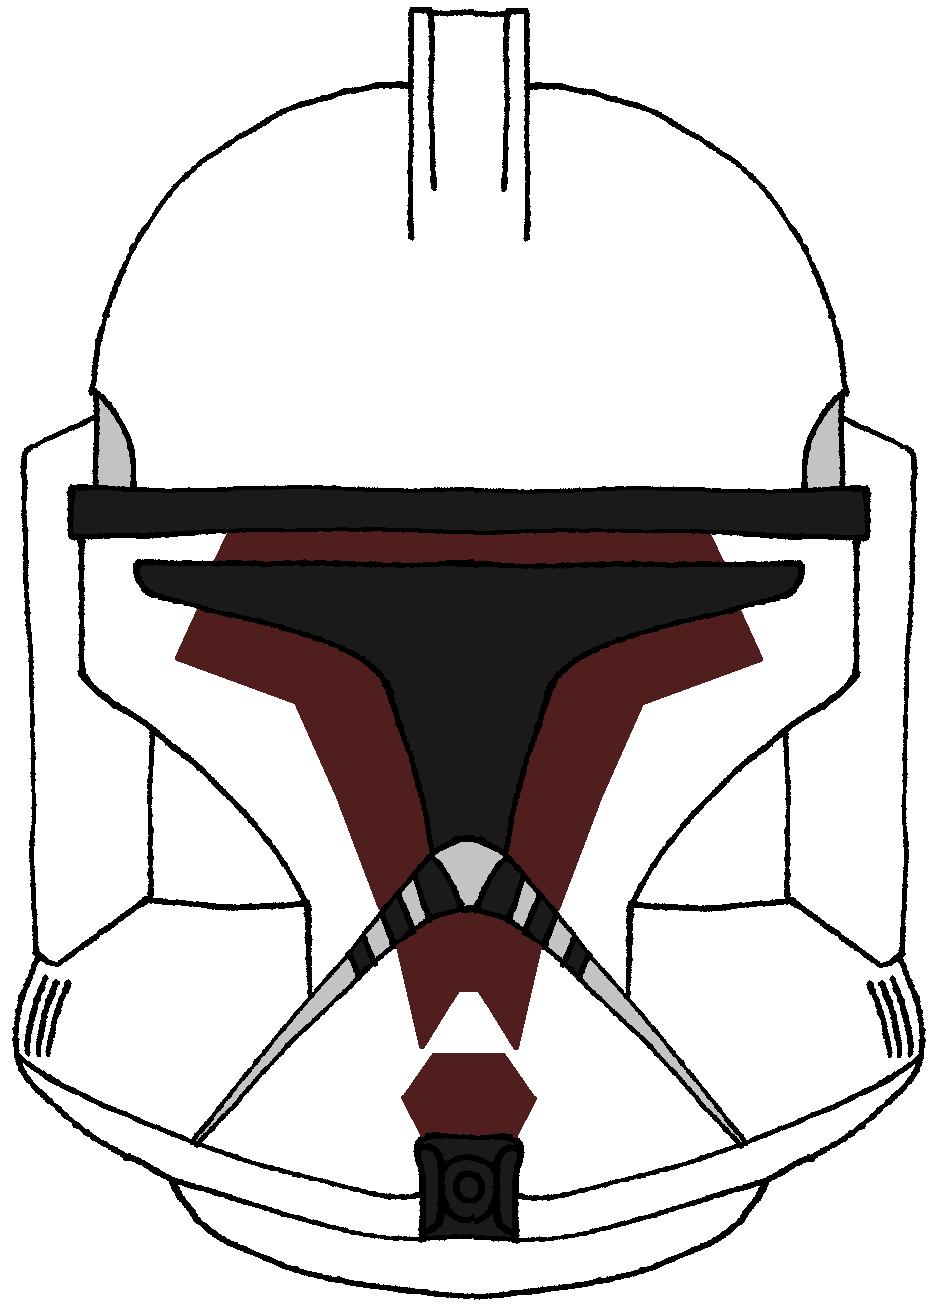 clone trooper helmet keeli u0027s company clone trooper helmets